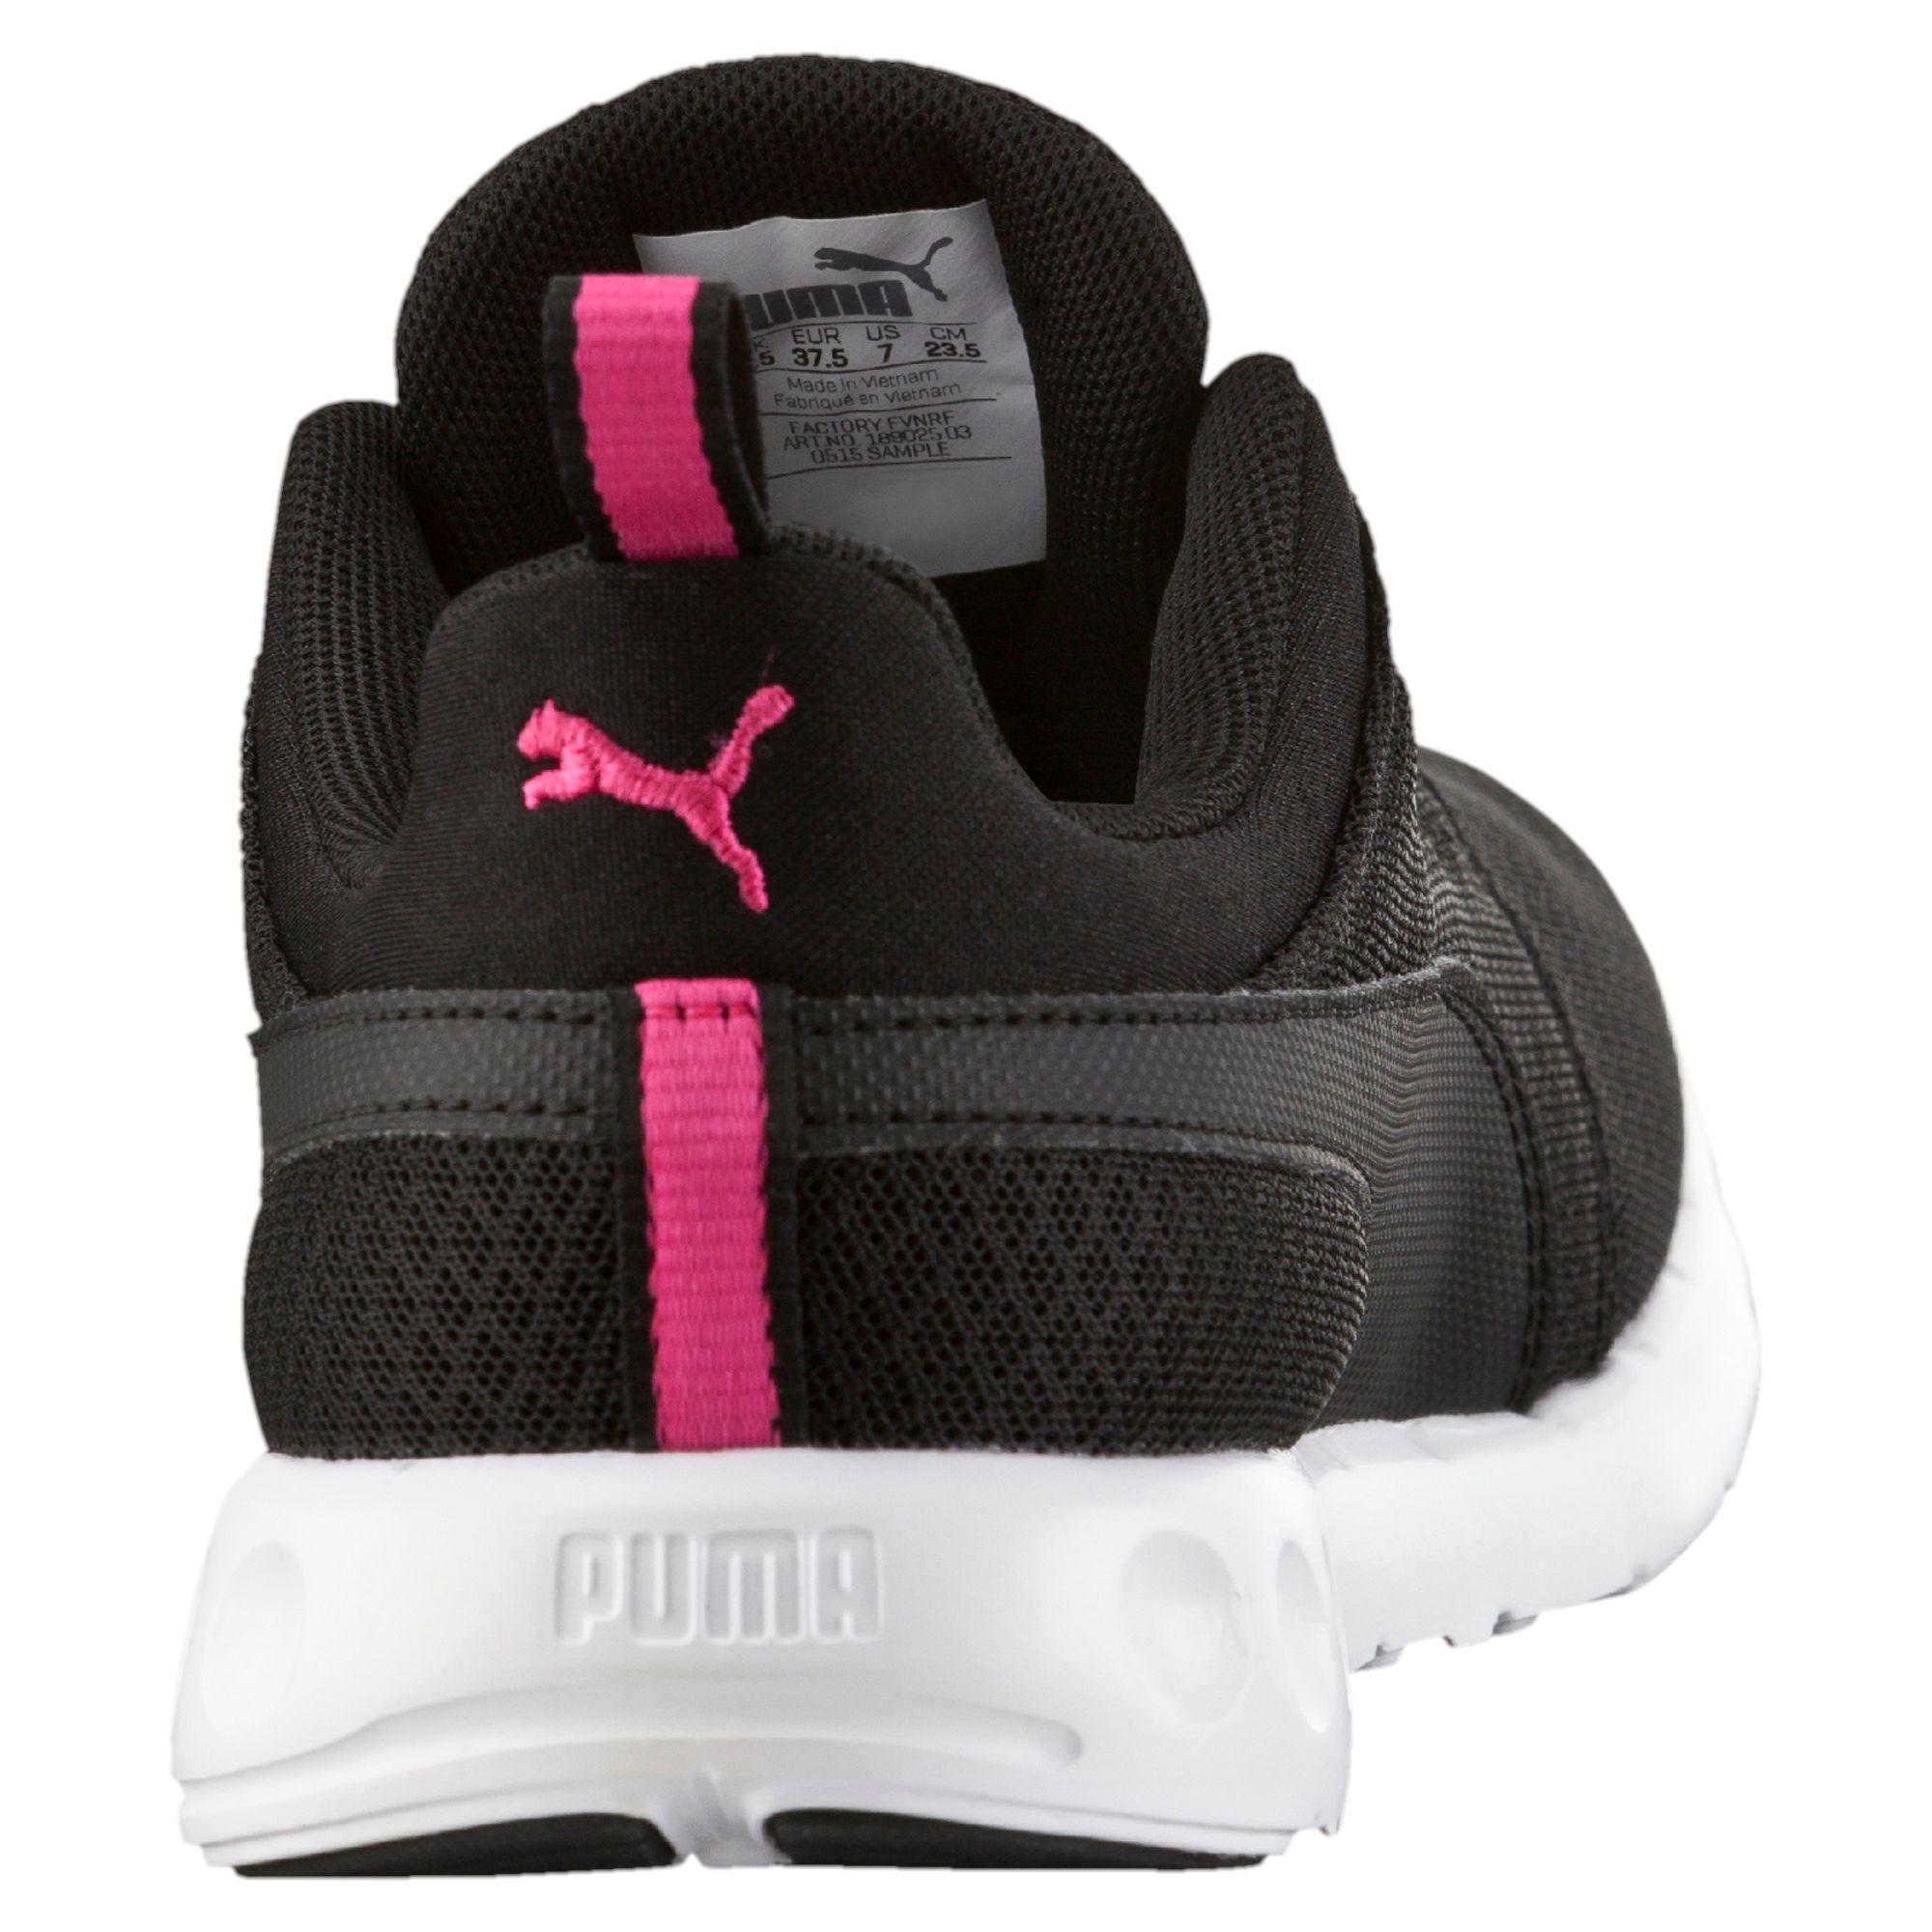 PUMA Carson Mesh Damen Laufschuhe Laufschuhe Laufschuhe Frauen Schuhe Laufen Neu dc53c4